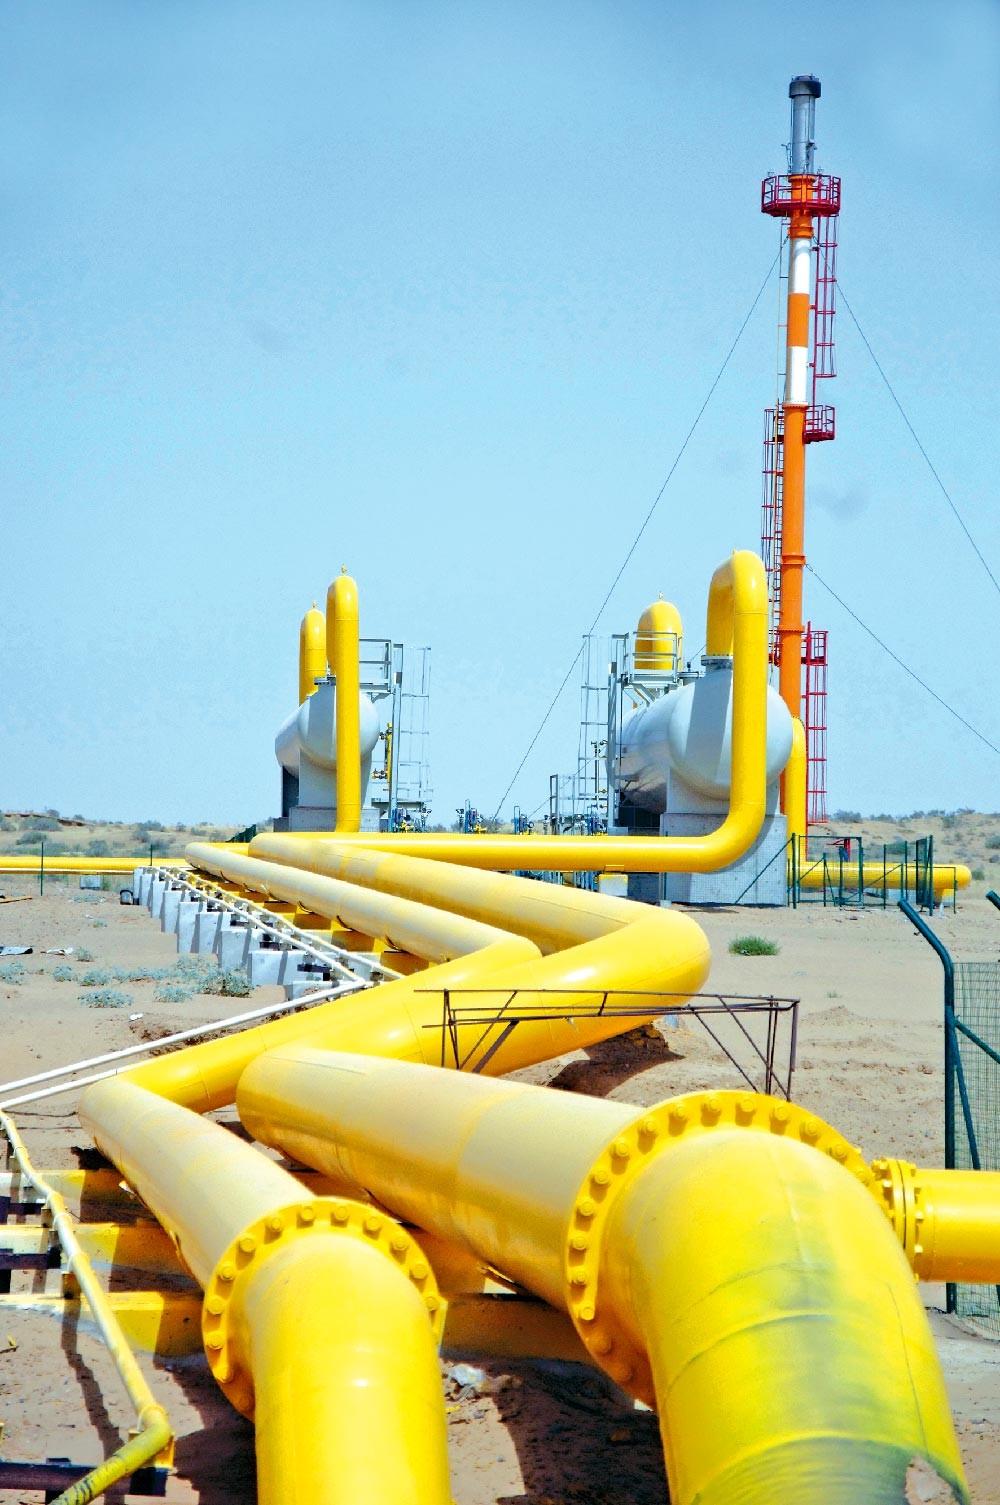 https://www.oilgas.gov.tm/storage/posts/2580/original-160e4171291c47.jpeg